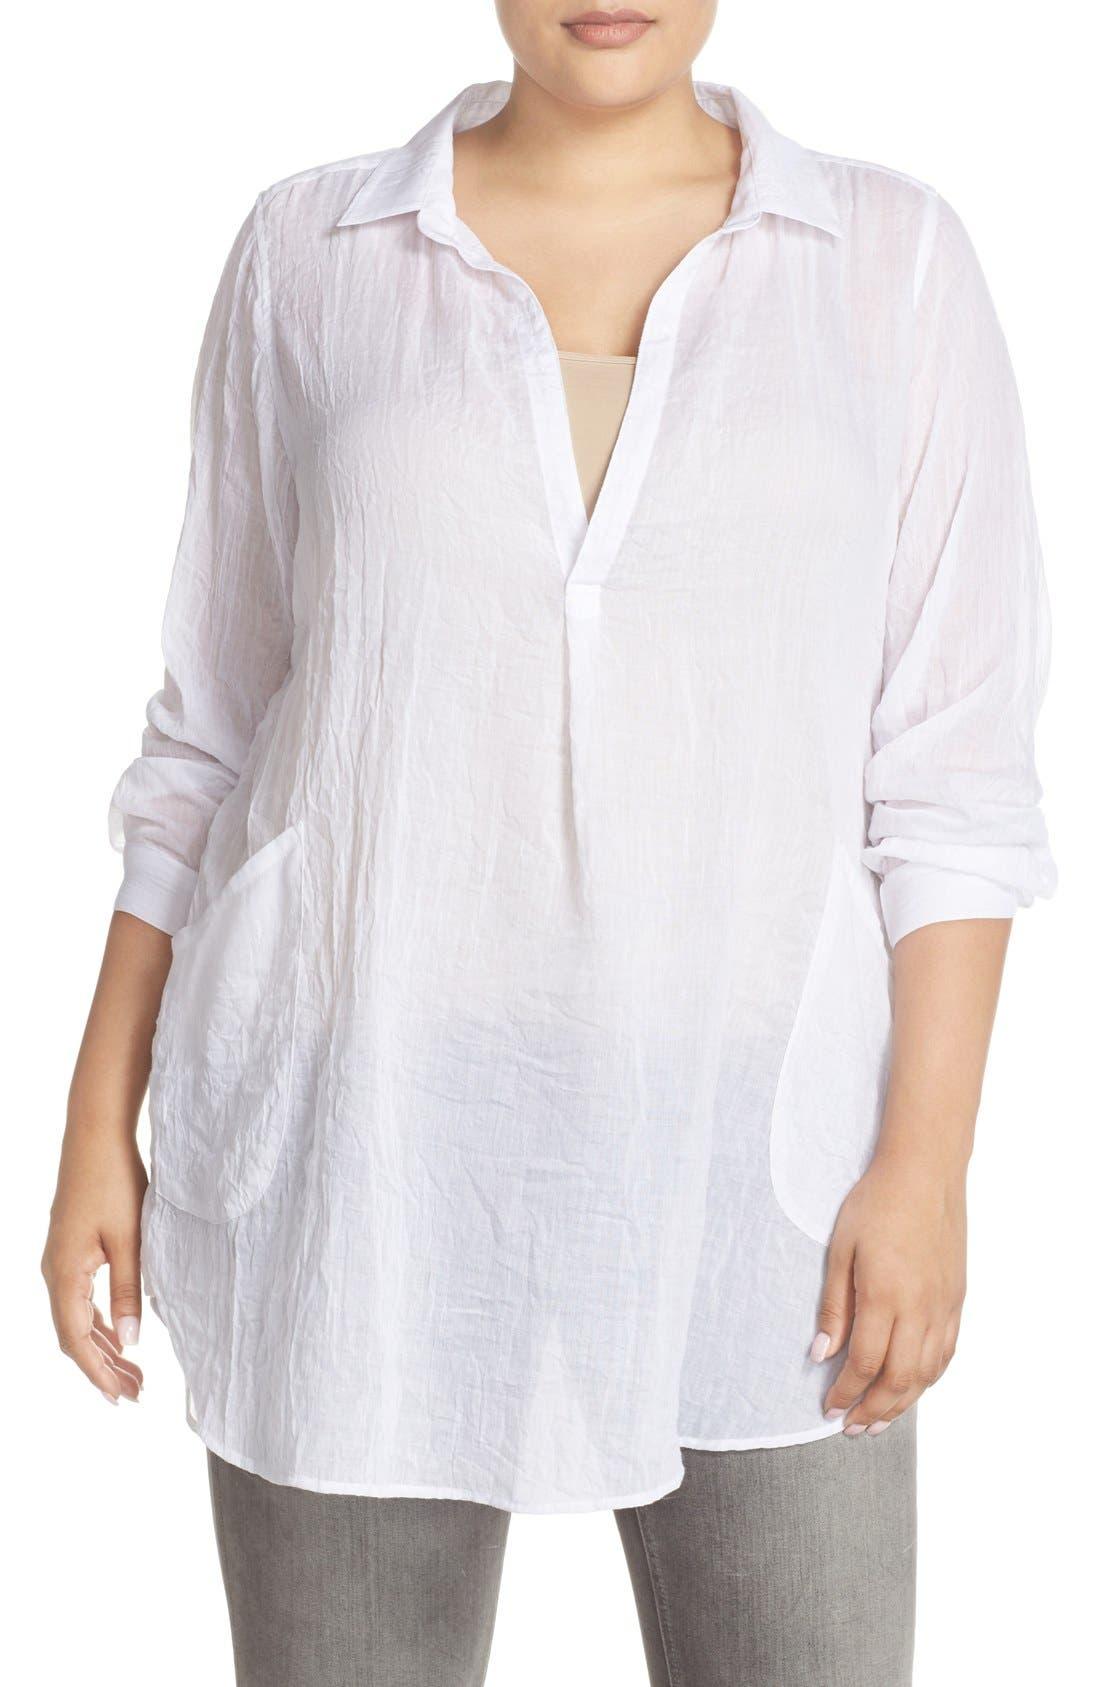 Alternate Image 1 Selected - Melissa McCarthy Seven7 Patch Pocket Tunic Shirt (Plus Size)